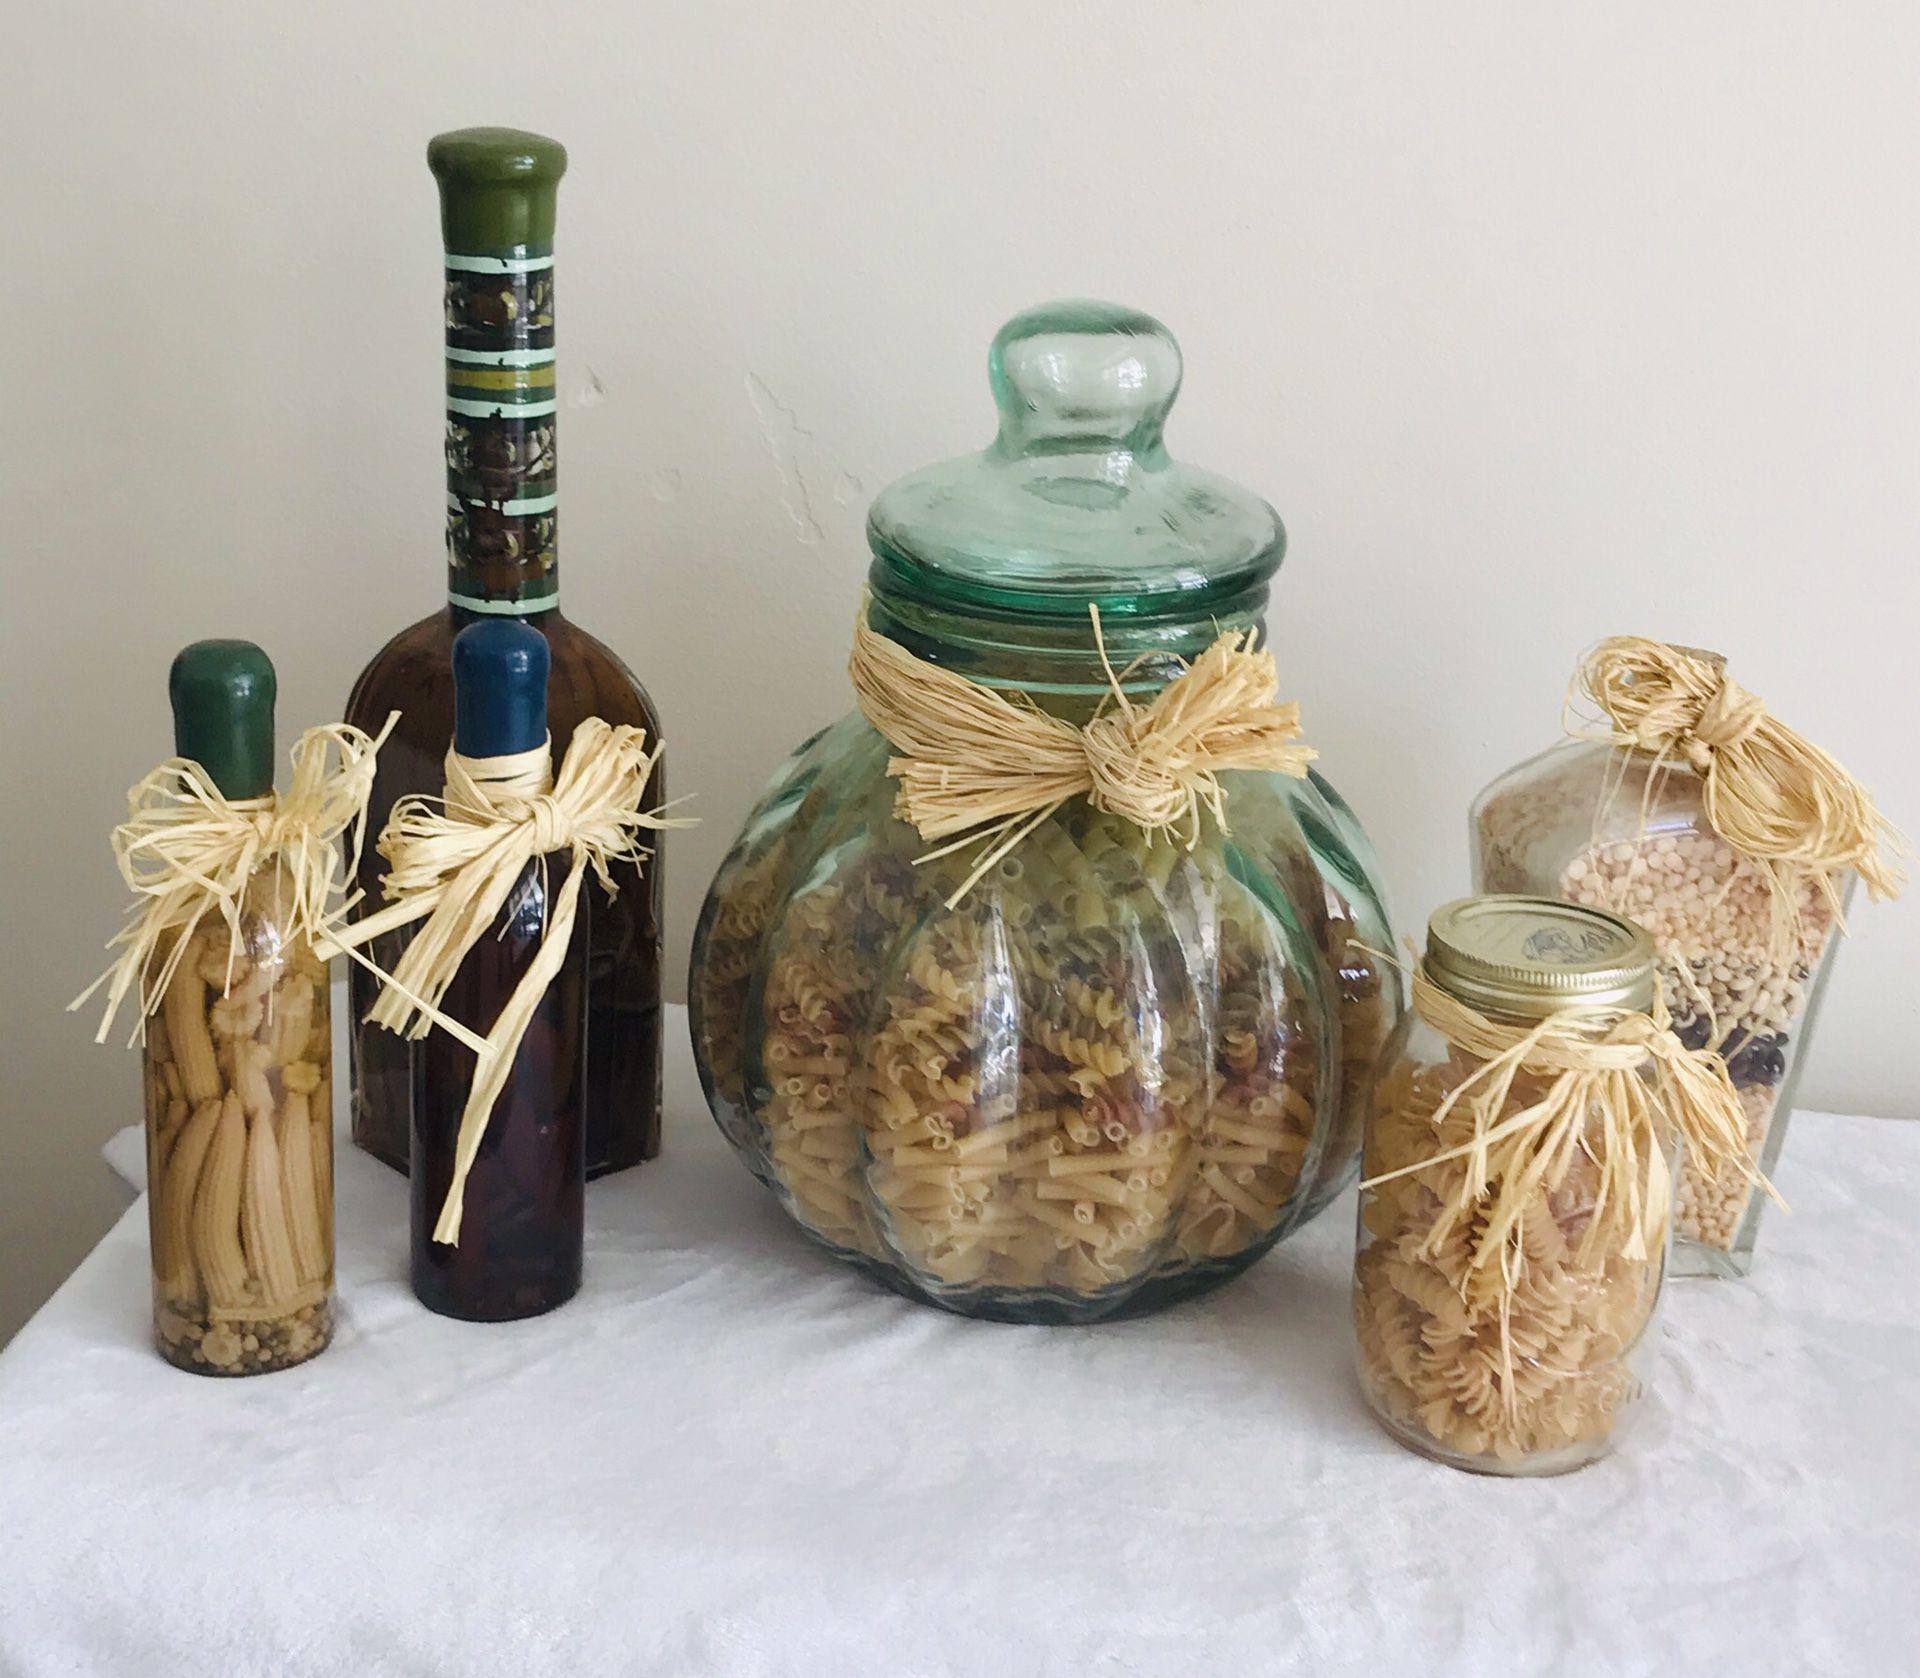 6 Piece Glass Jar Set Kitchen Decor 🖤